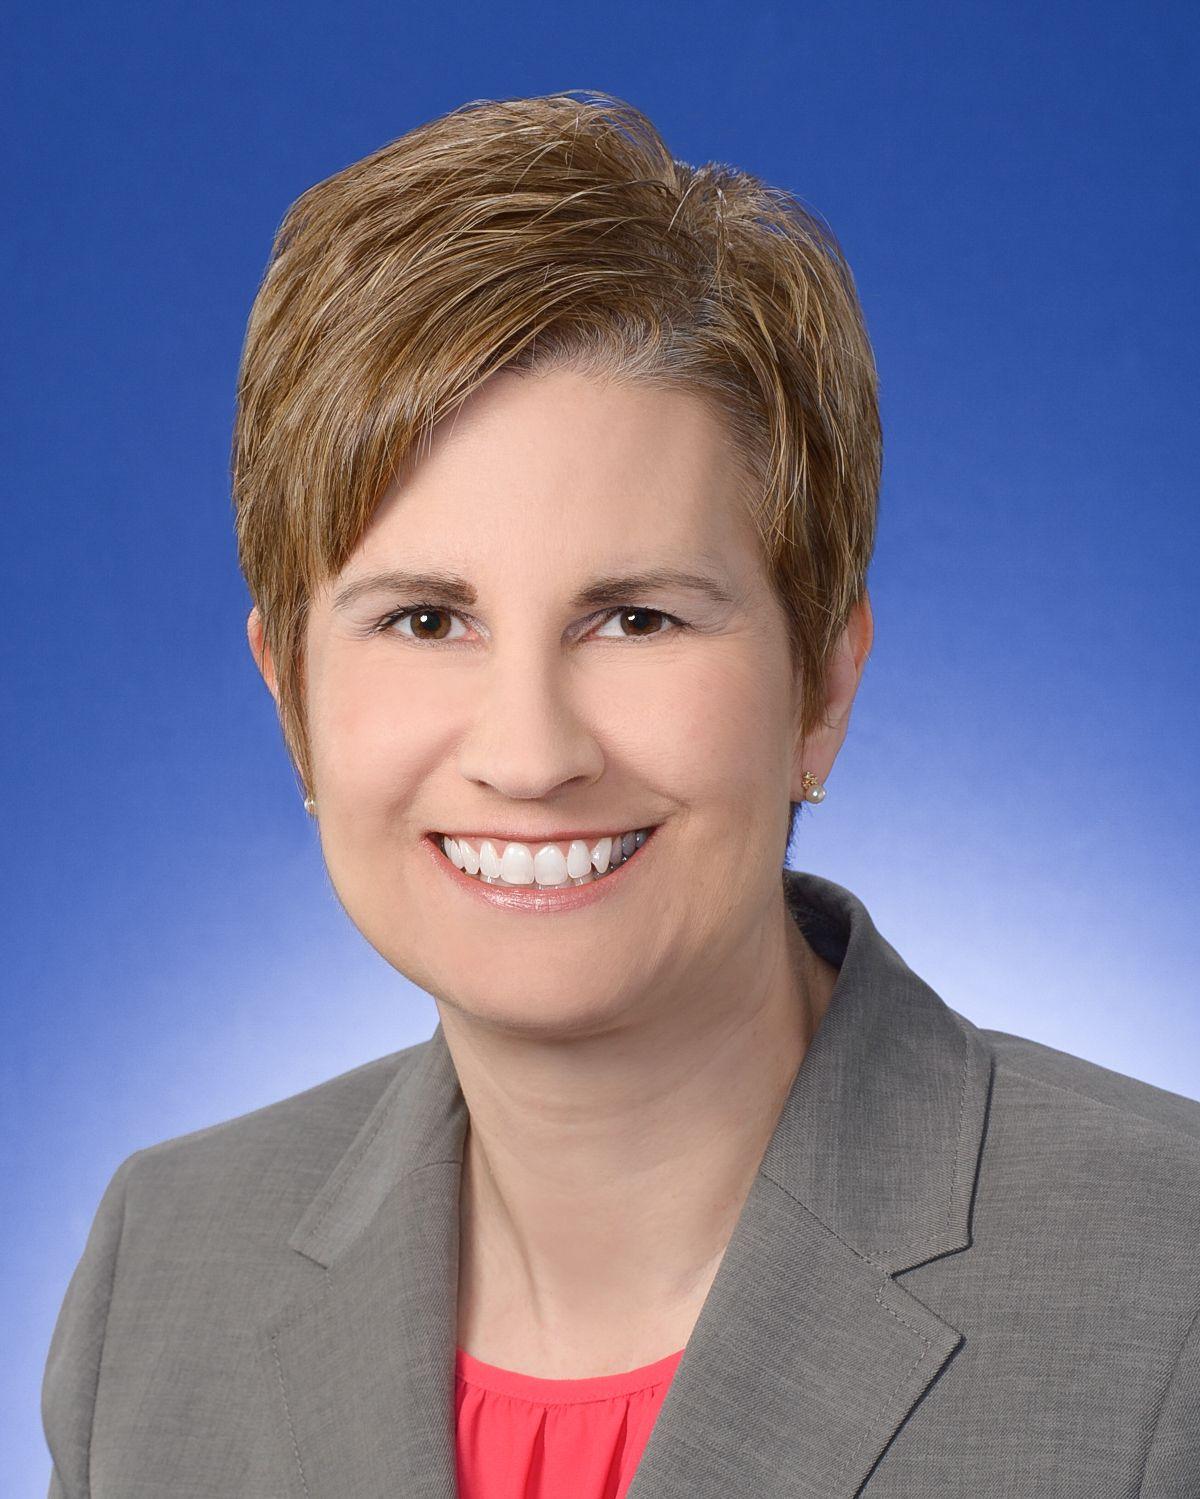 Theresa A. Basciano, QKA